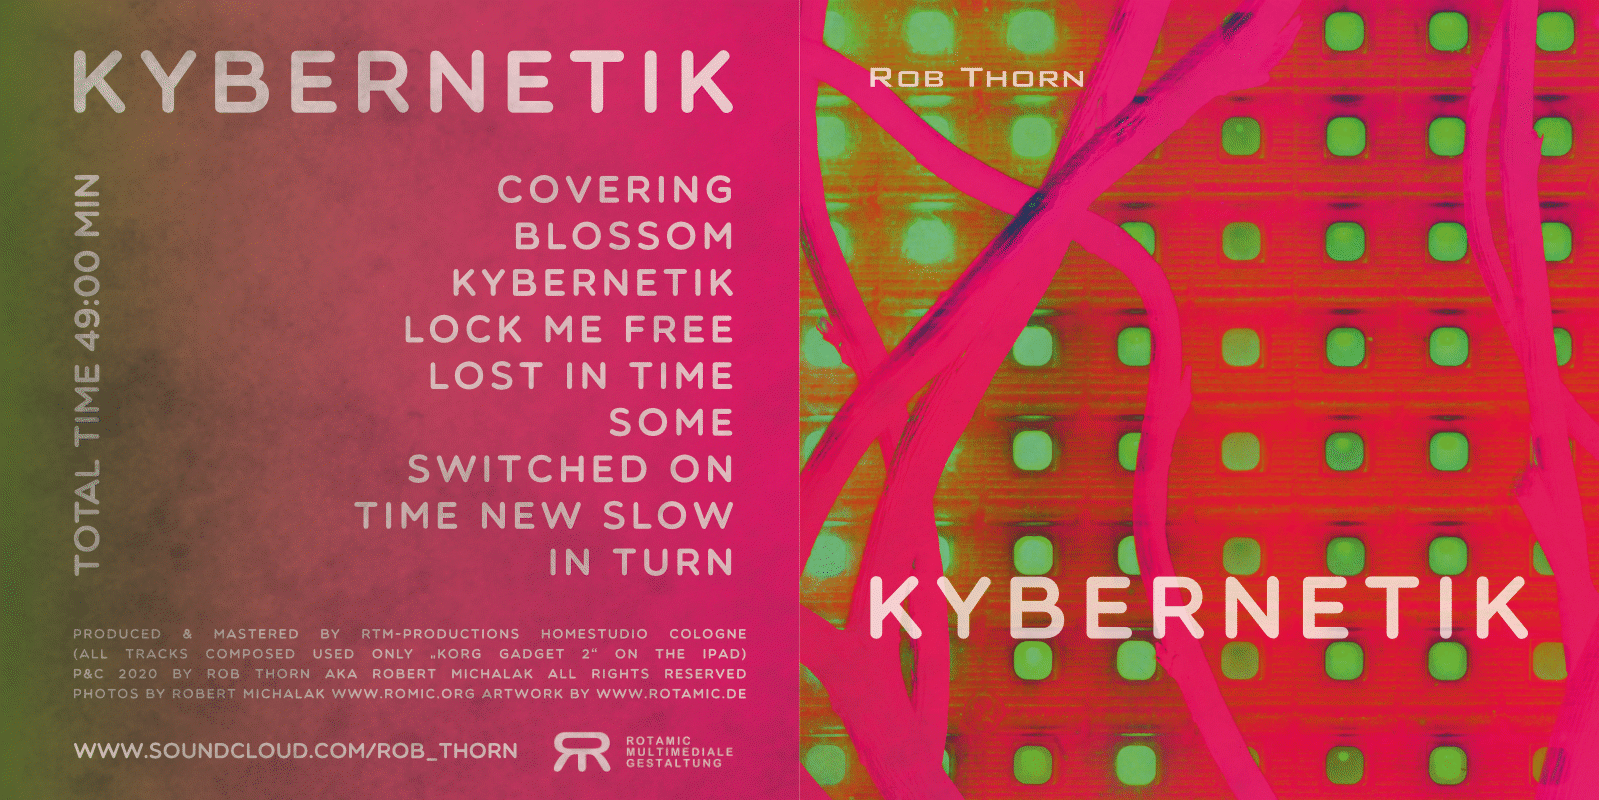 RT-KYBERNETIK LP-Cover 2020 k